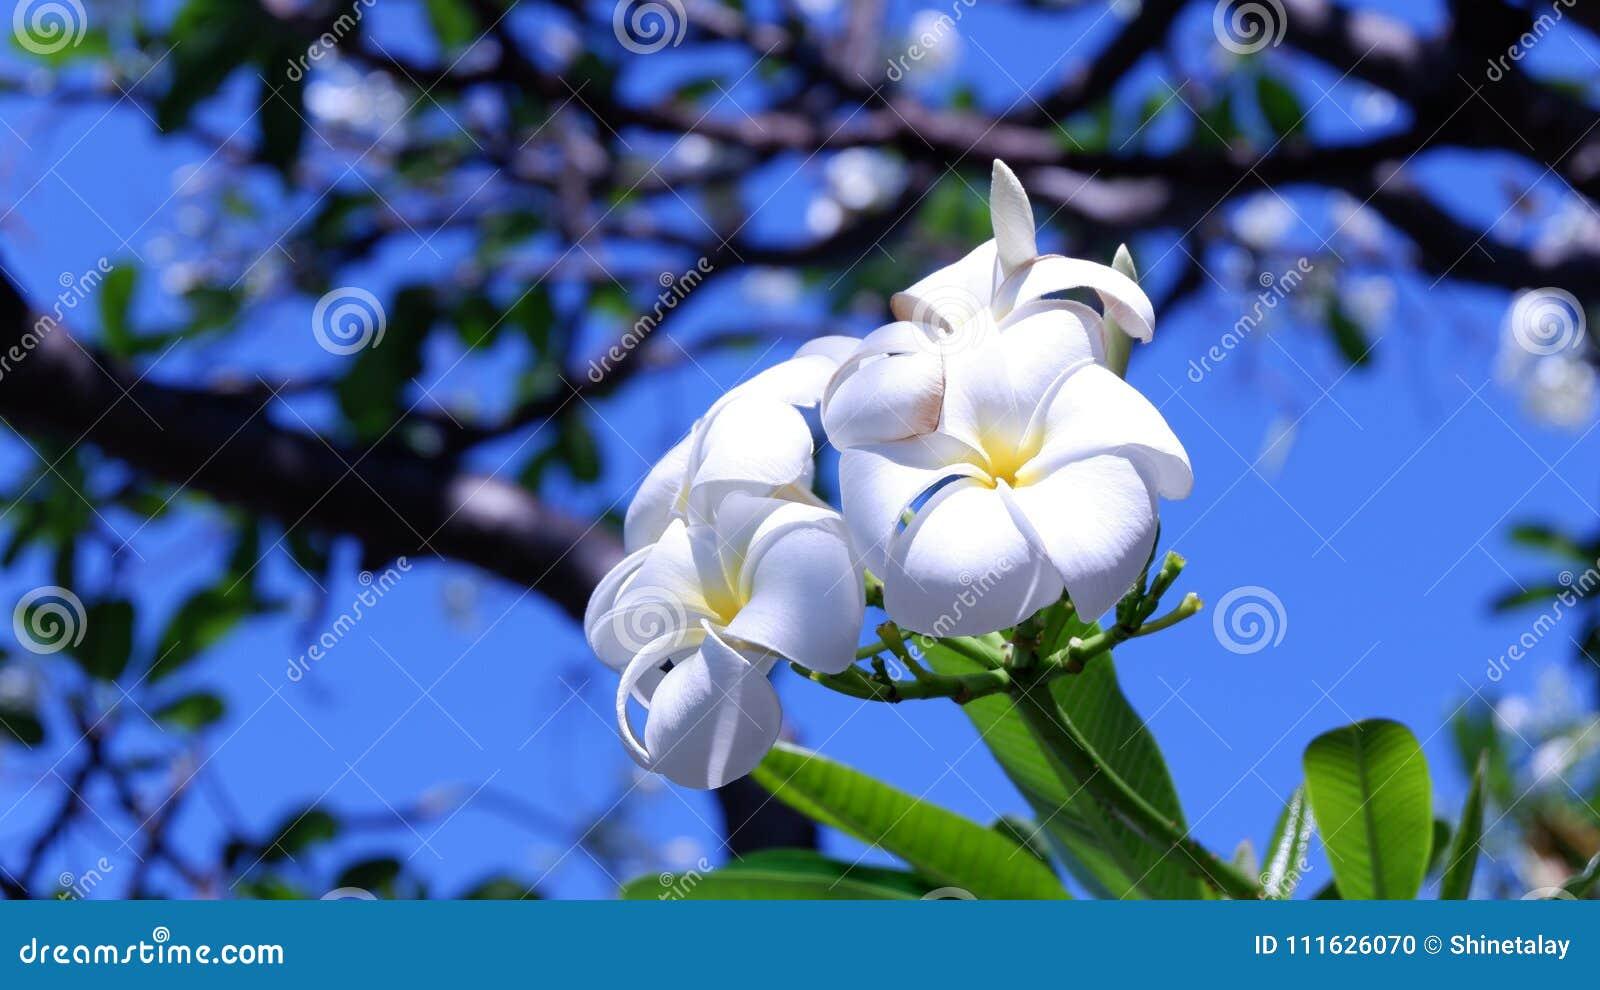 White Flowers Leelawadee Or Frangipani Stock Photo Image Of Moths